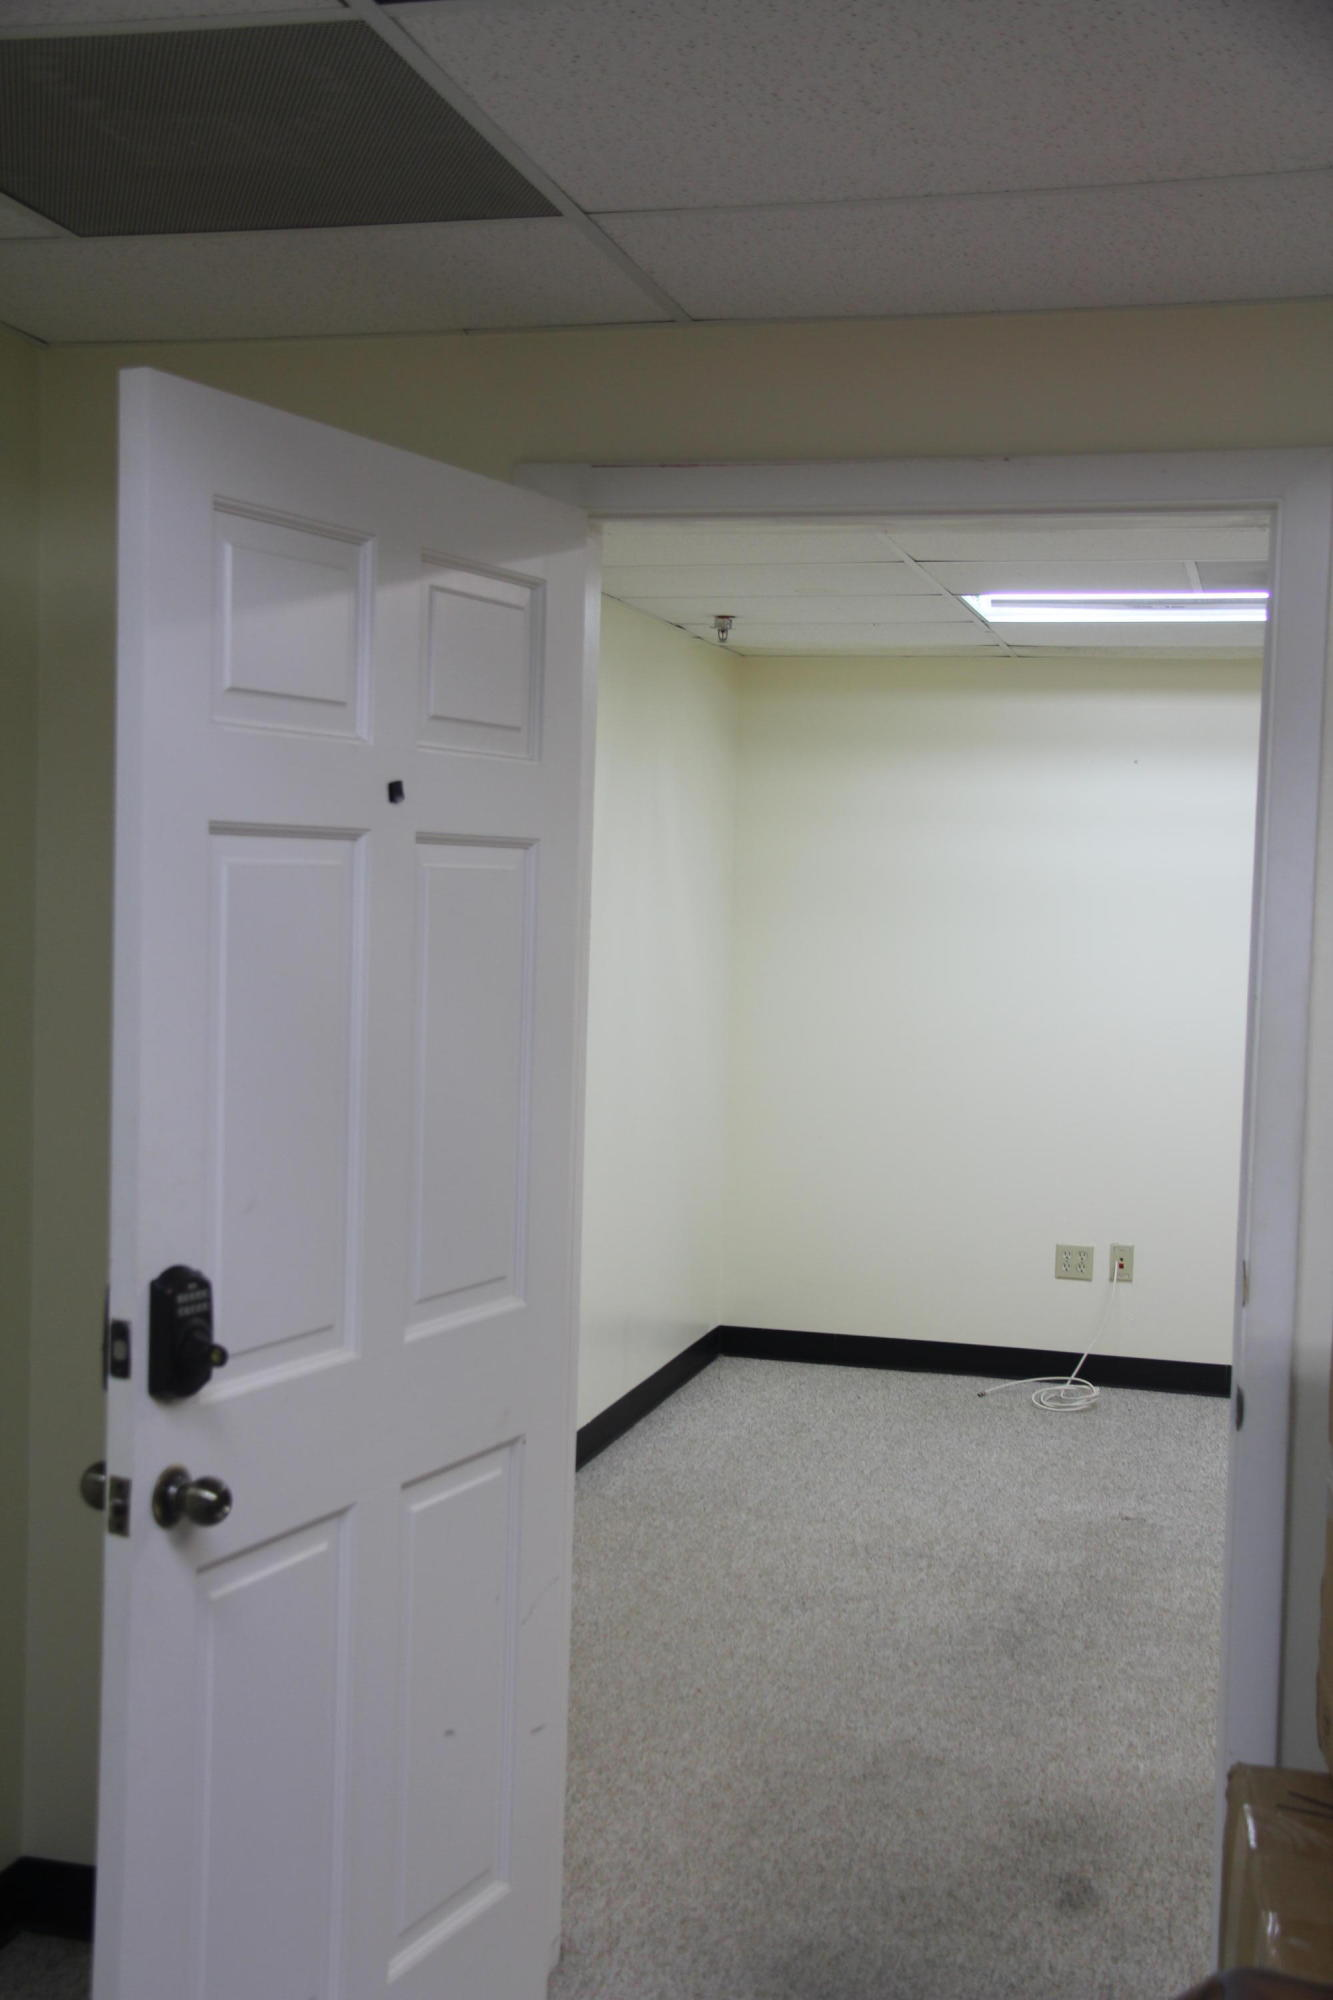 Additional photo for property listing at 9361 Thomas NEW 9361 Thomas NEW St Thomas, Virgin Islands 00802 United States Virgin Islands